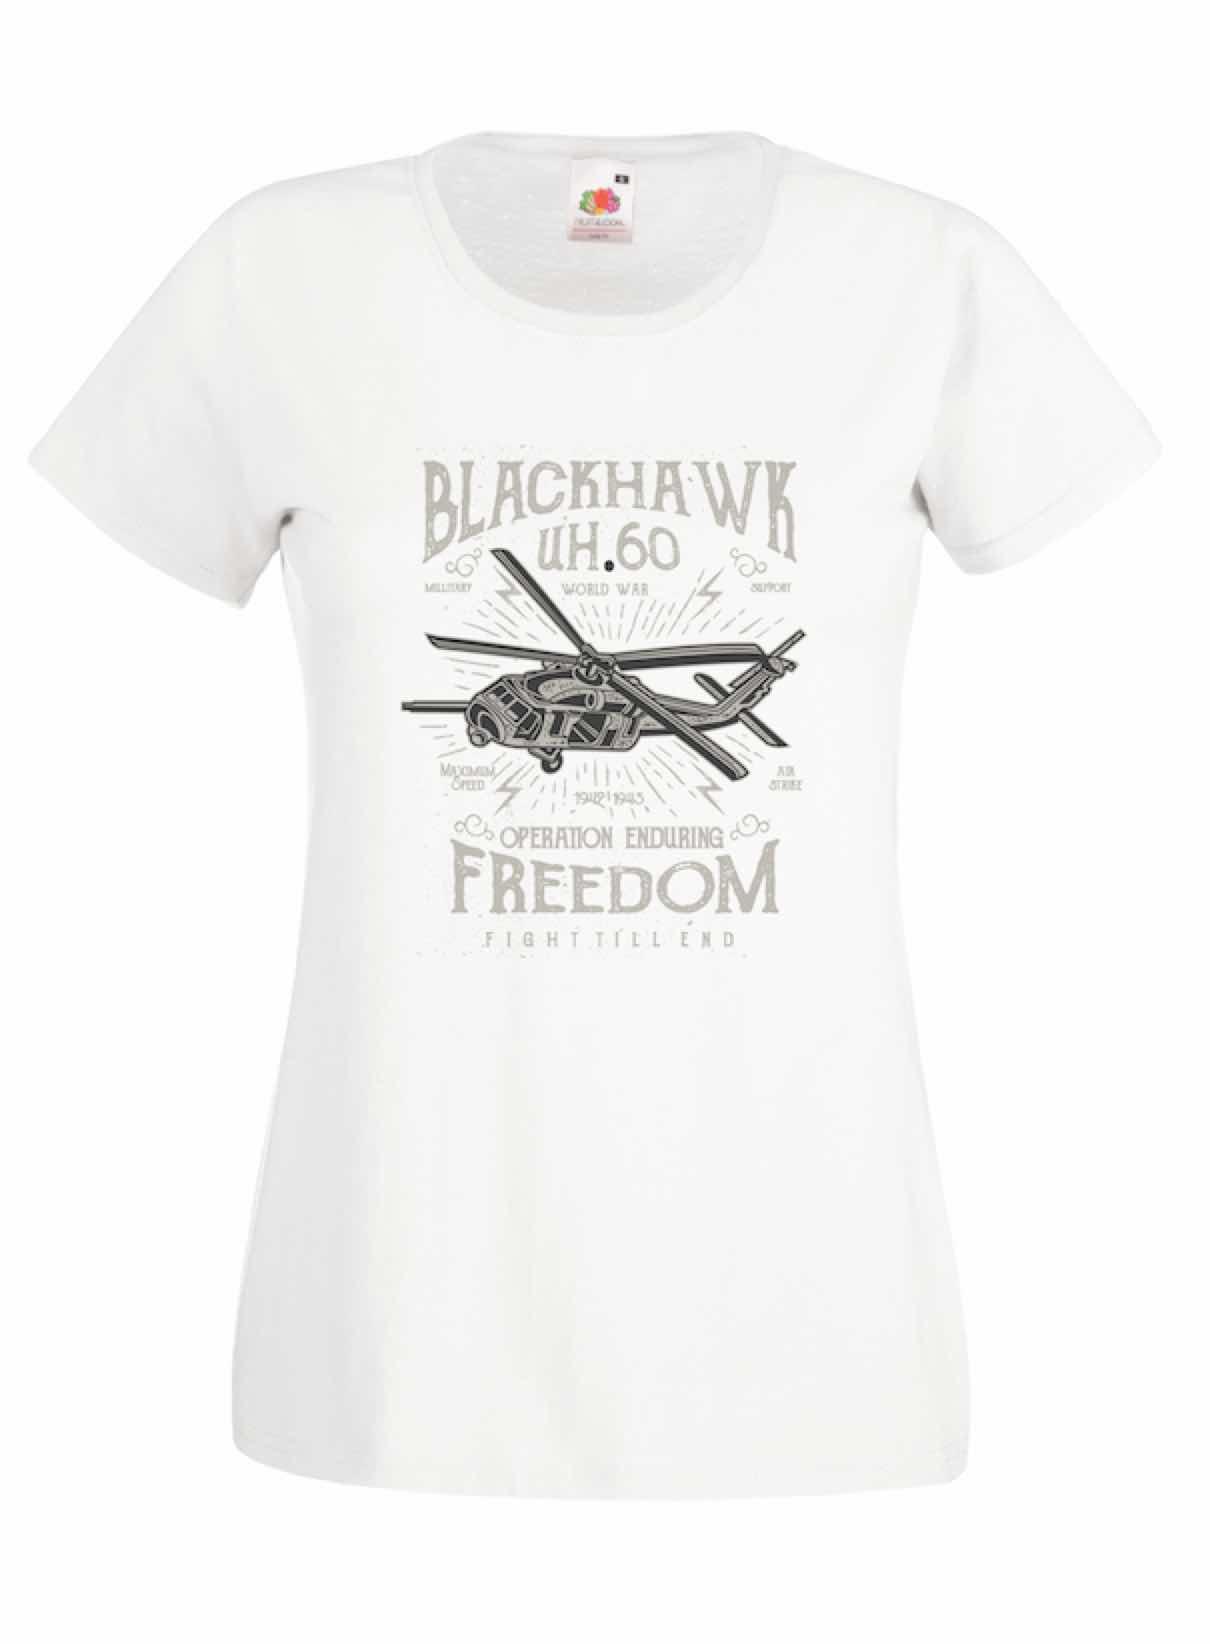 Blackhawk design for t-shirt, hoodie & sweatshirt